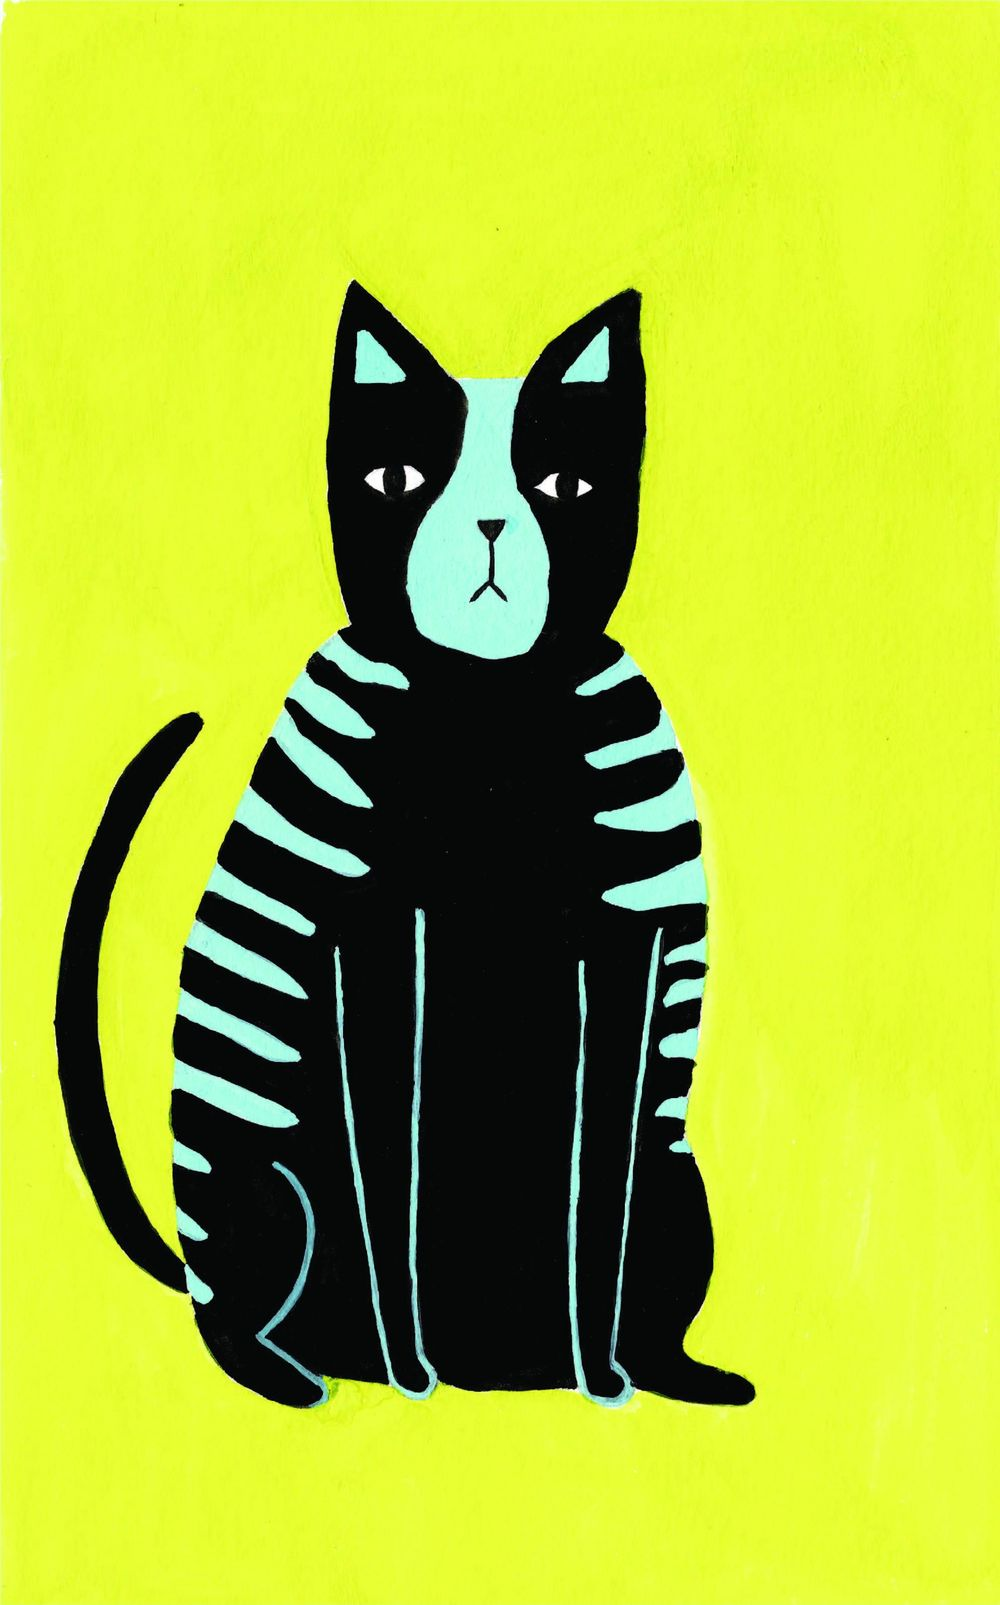 Fat Fluro Cat - image 1 - student project